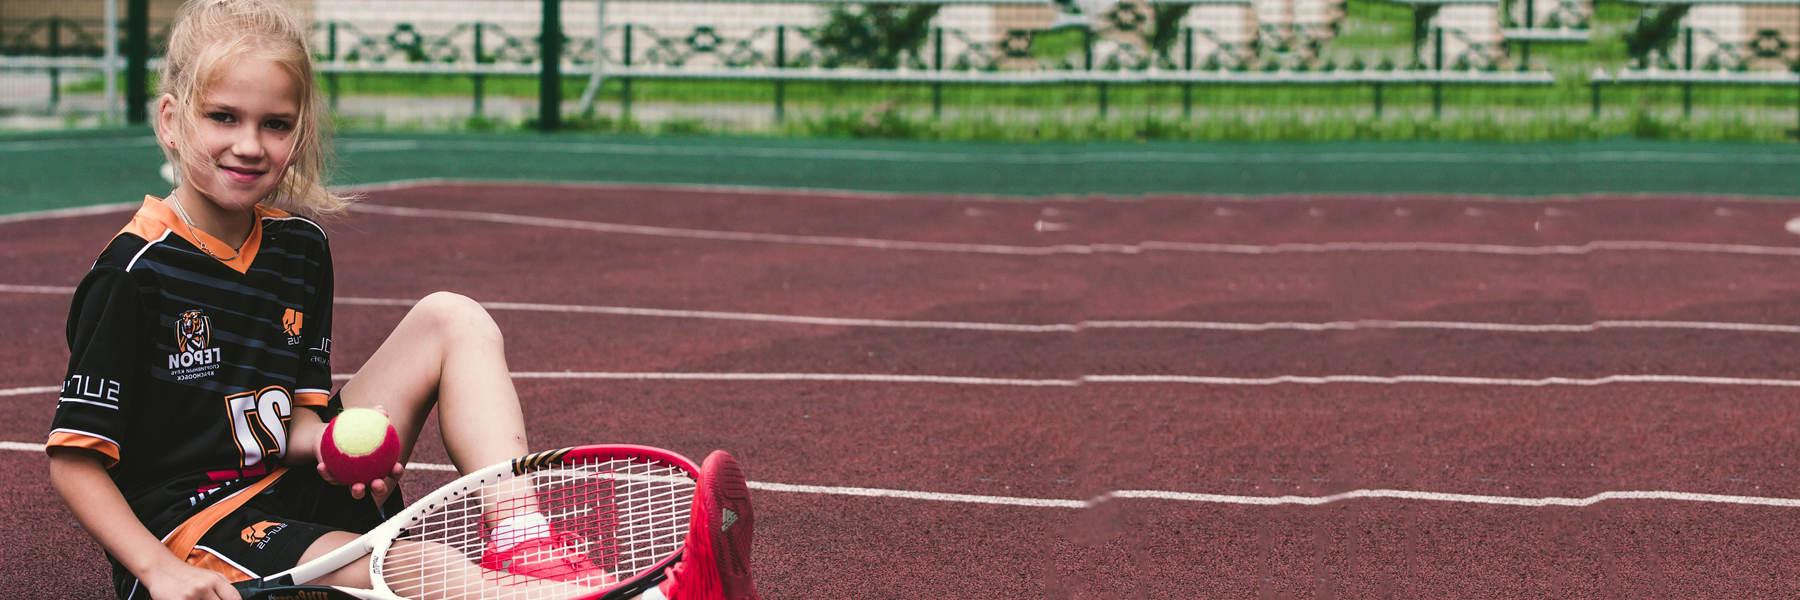 Tennis Club Software